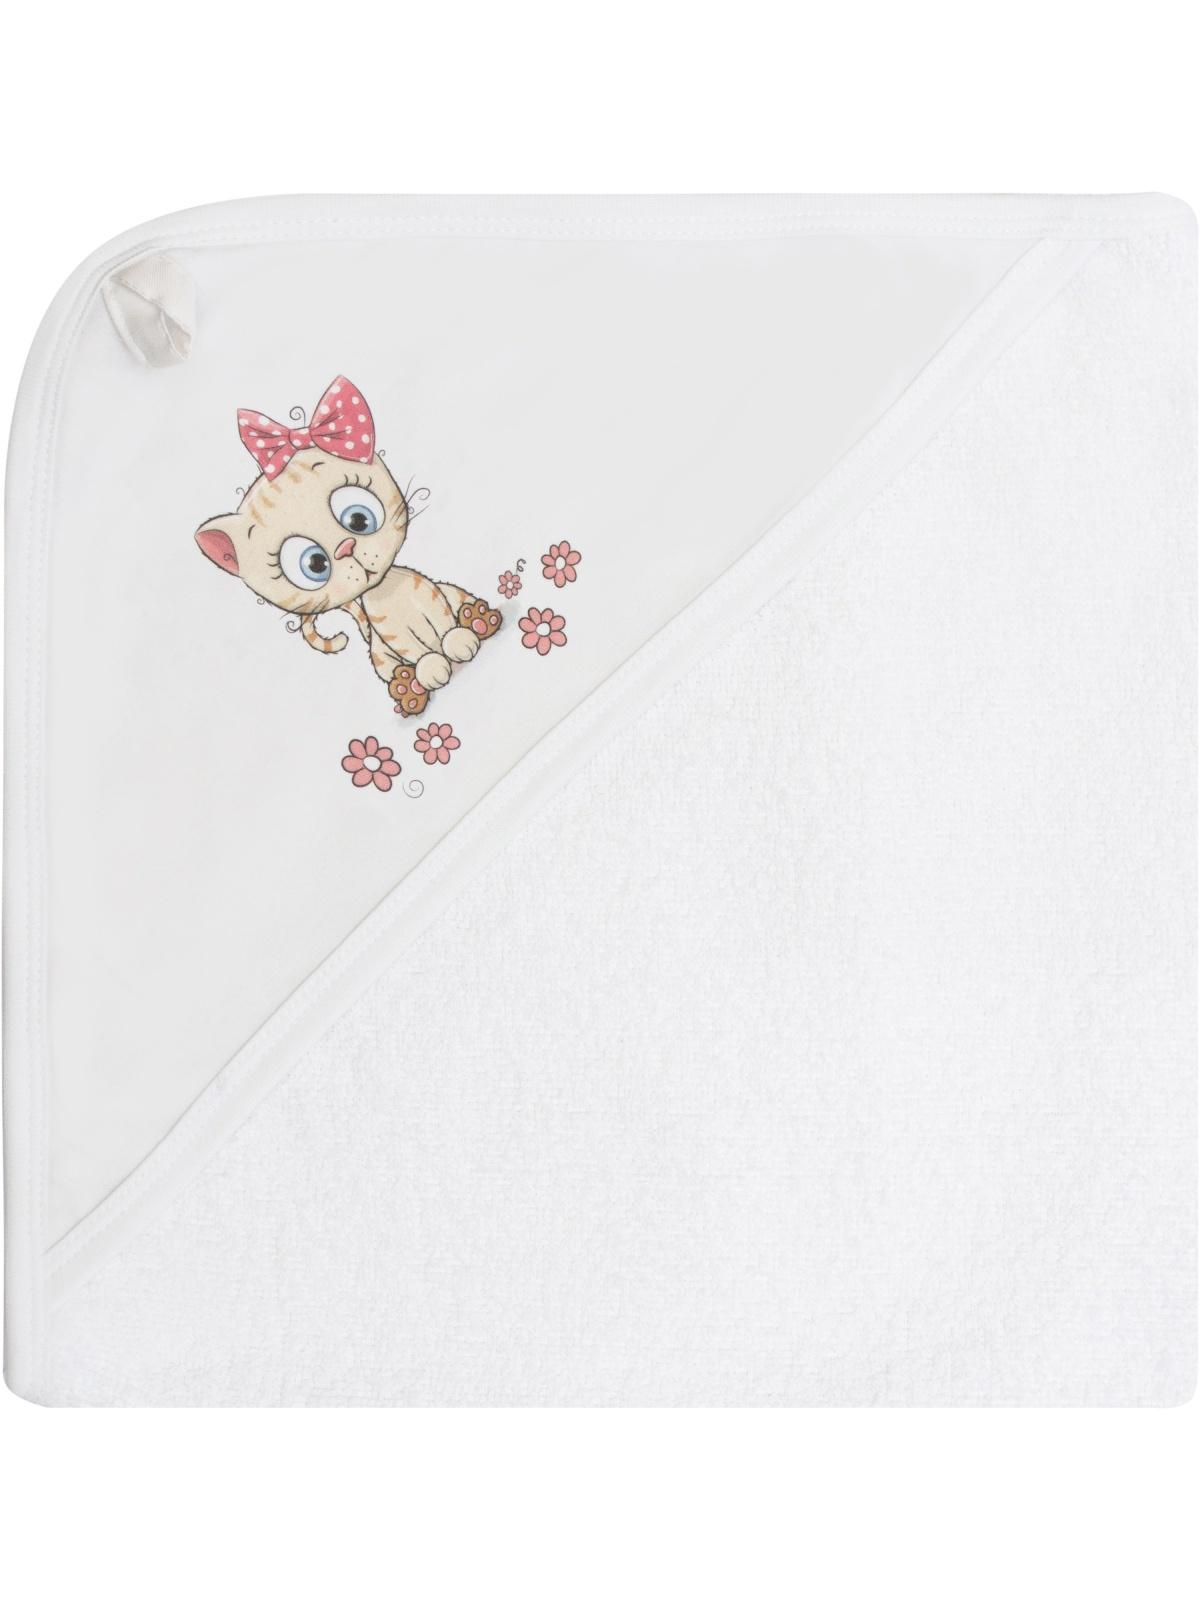 цена на Полотенце детское Luxury Baby Полотенце с уголком и принтом